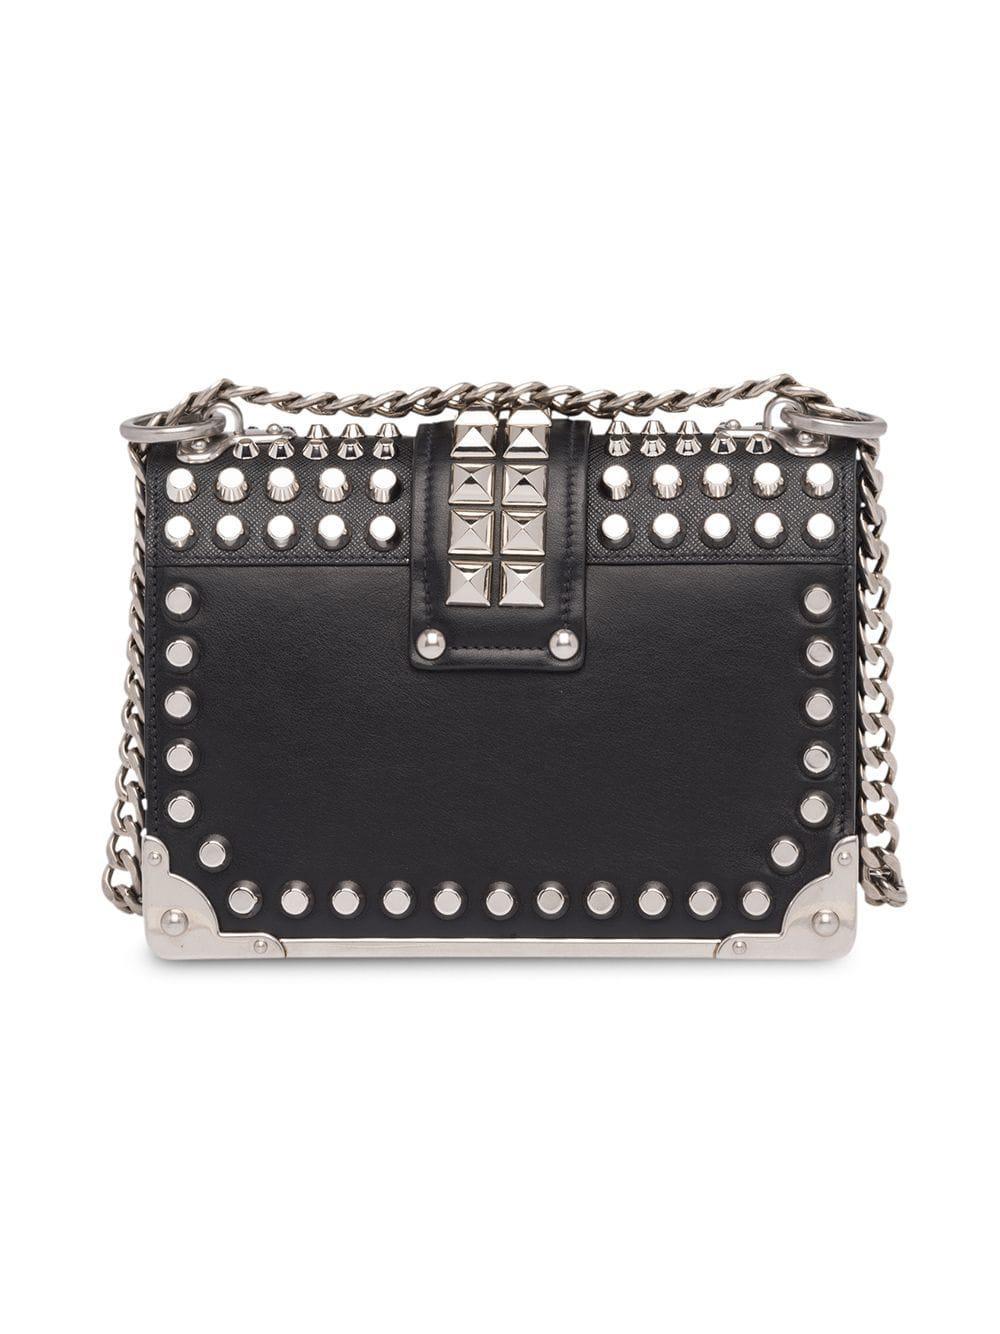 d141303708bb65 Prada Cahier Studded Bag in Black - Lyst